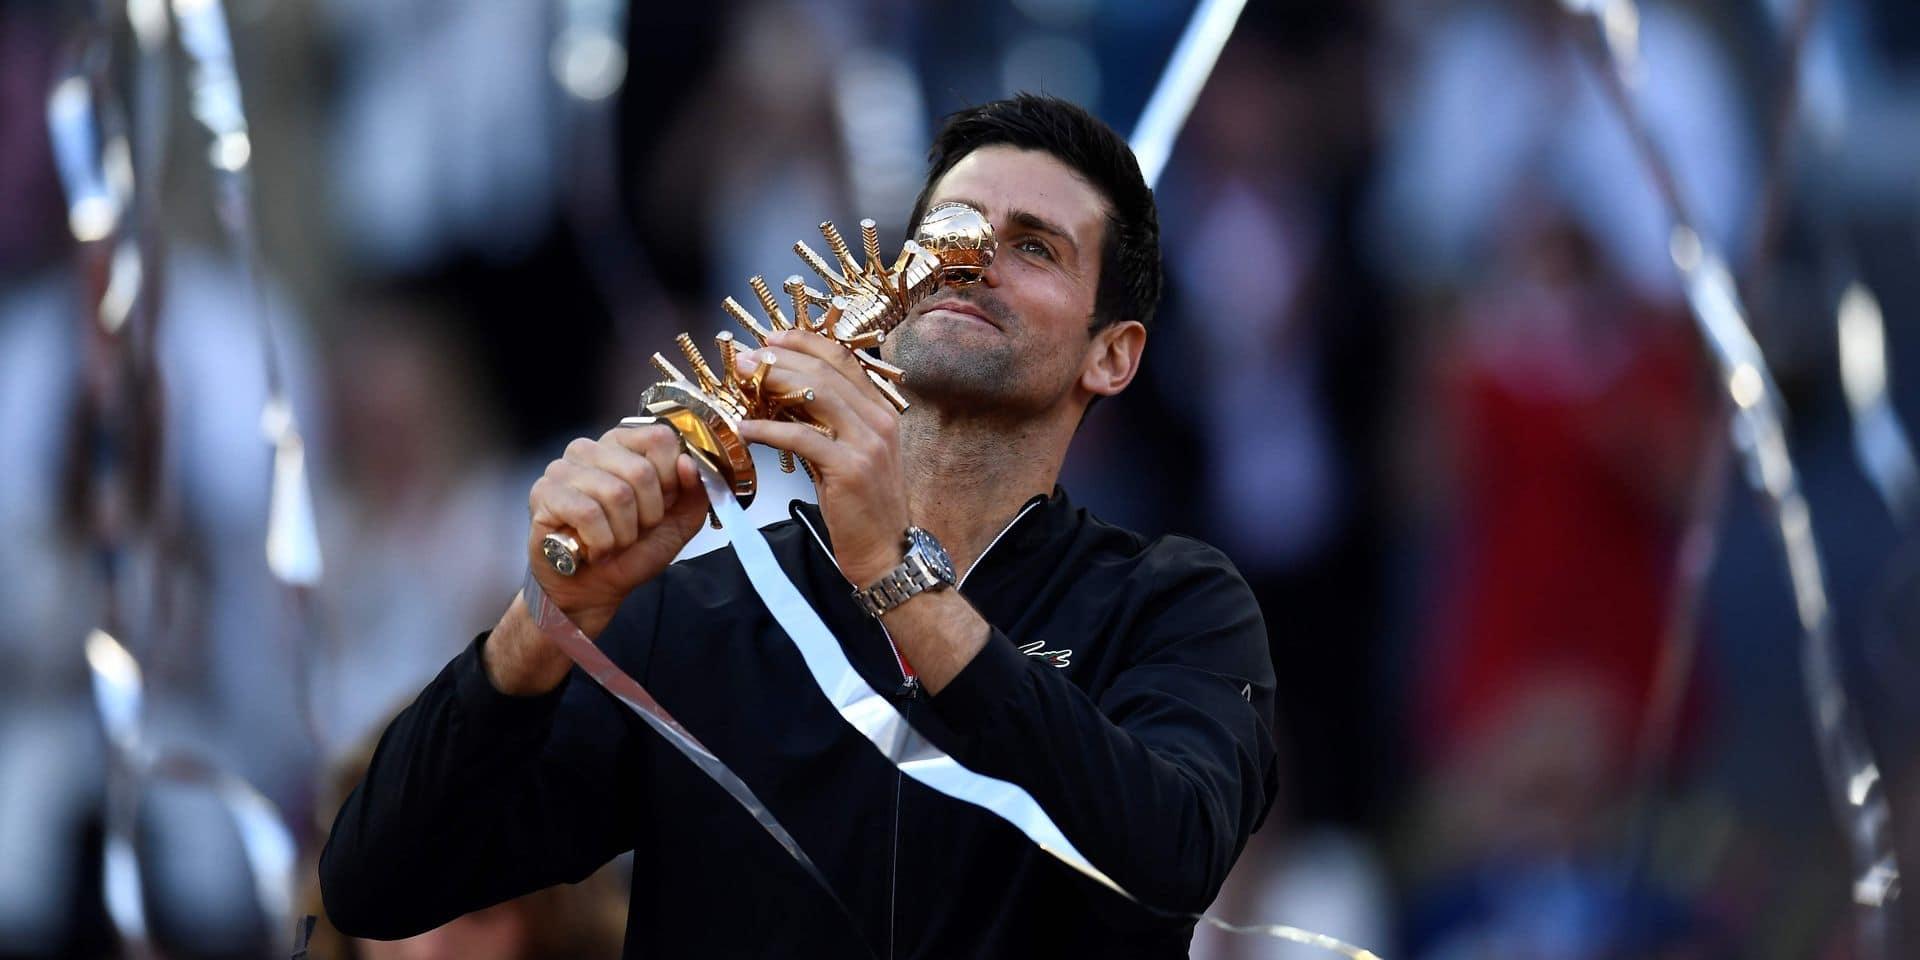 Classement ATP: Djokovic conforte sa place de N.1 mondial, Goffin reste 23e